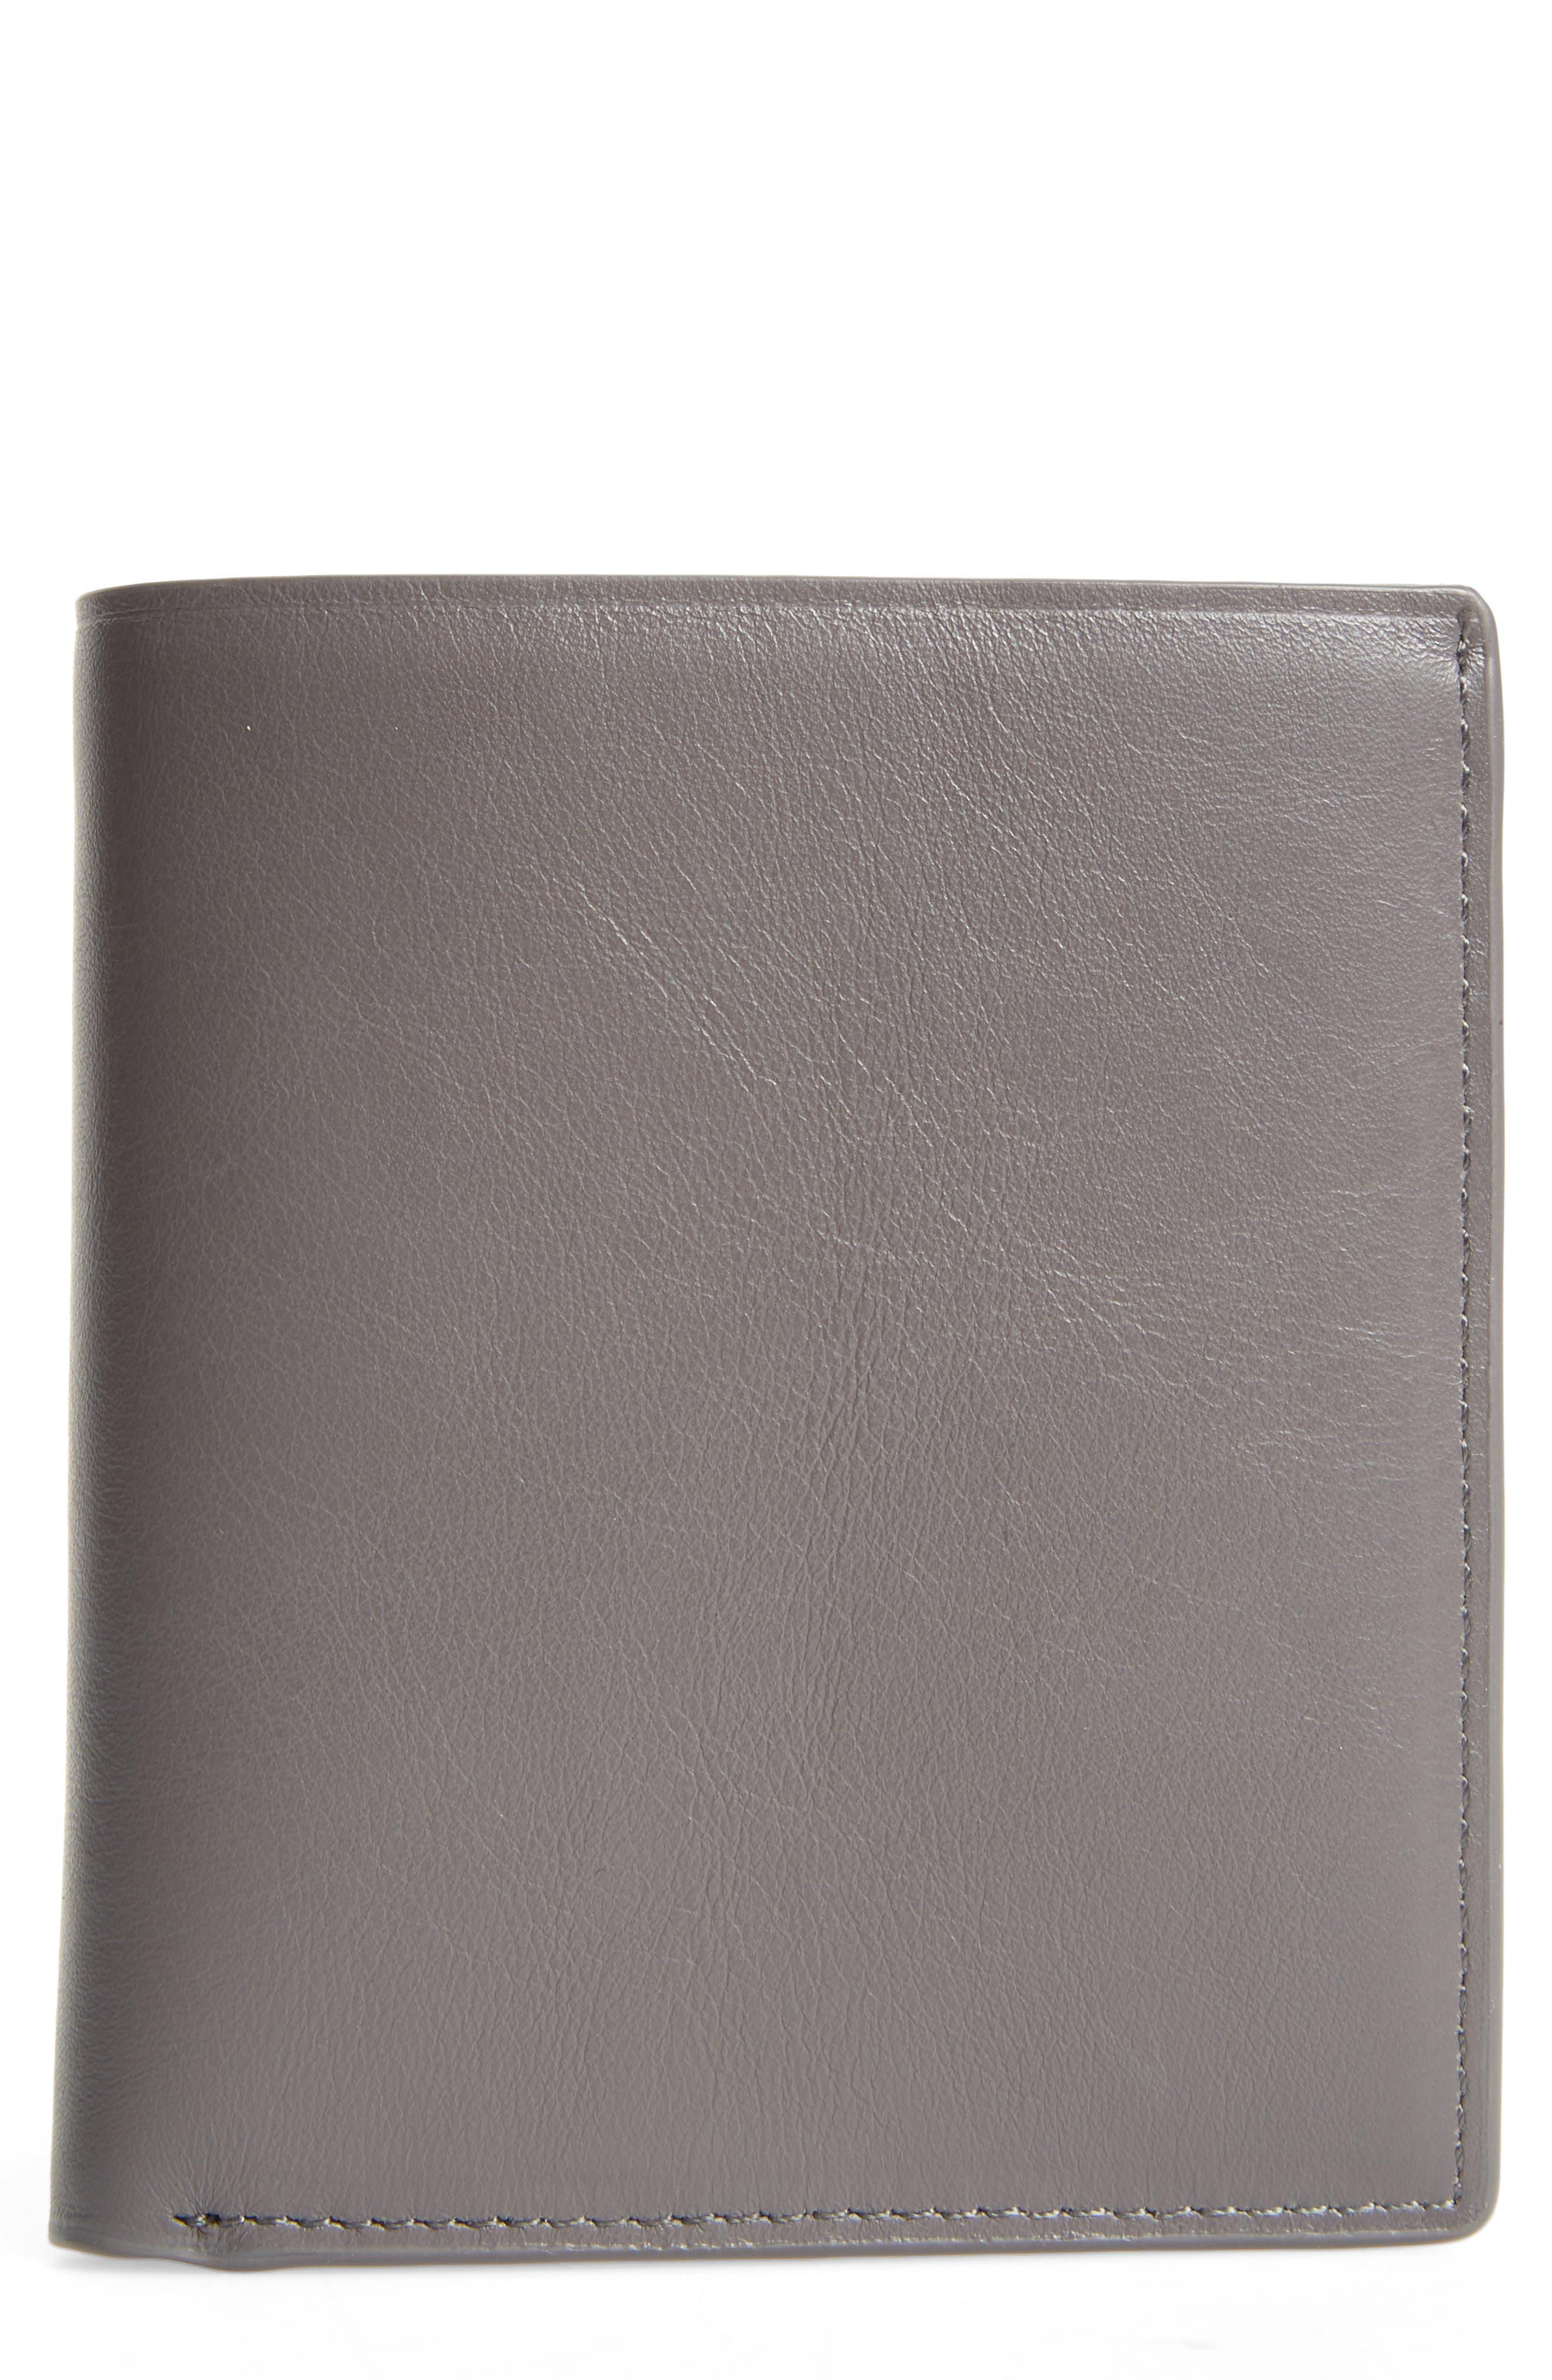 Bradley Bifold Leather Wallet,                             Main thumbnail 1, color,                             032